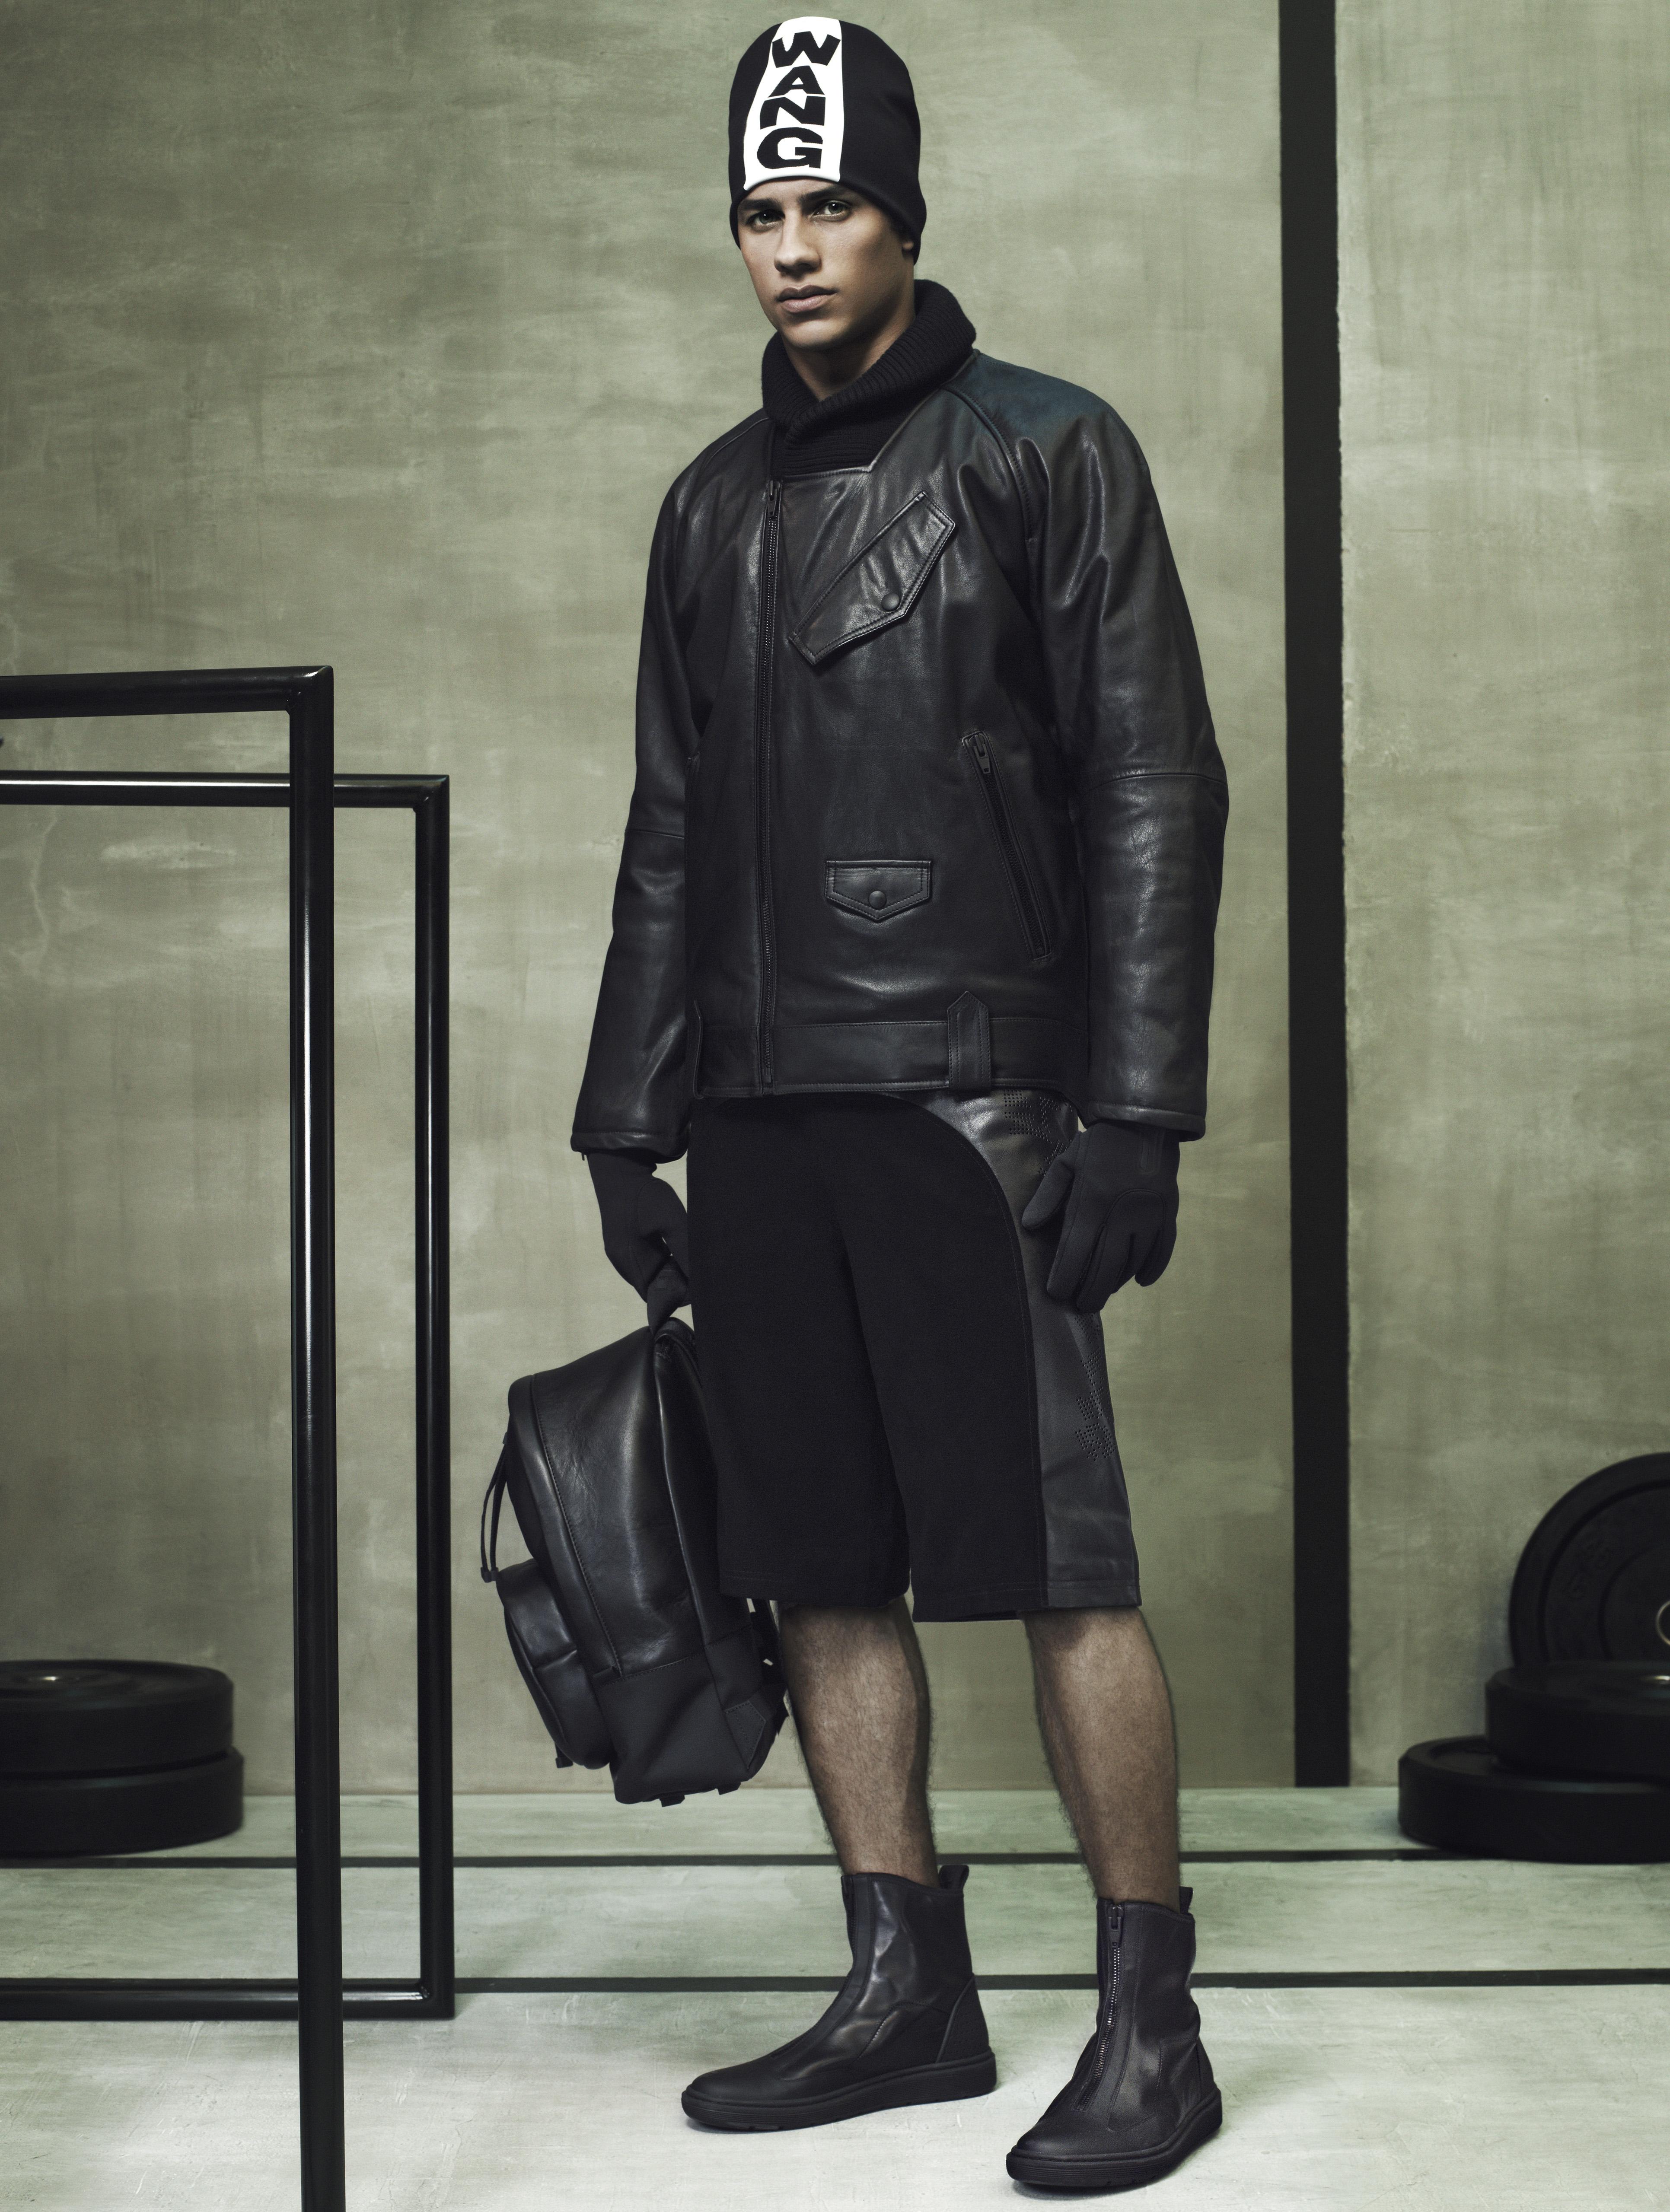 de1155fe1 Alexander Wang x H&M Full Collection Lookbook | Complex